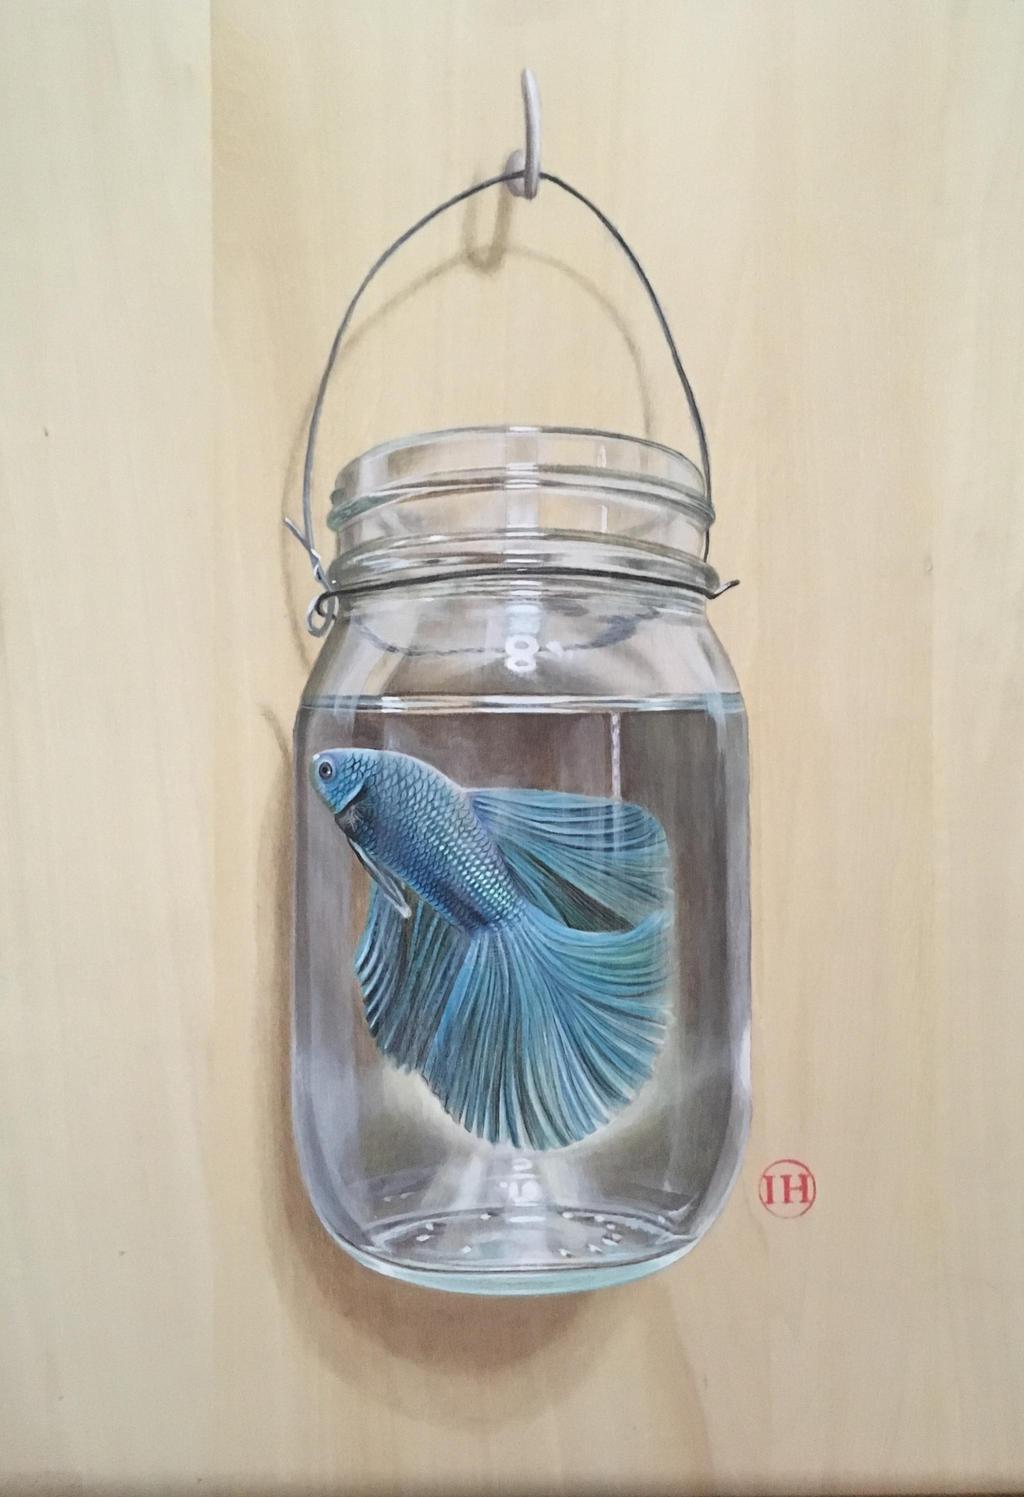 Betta fish in a jar by ivanhooart on deviantart for Fish in a jar